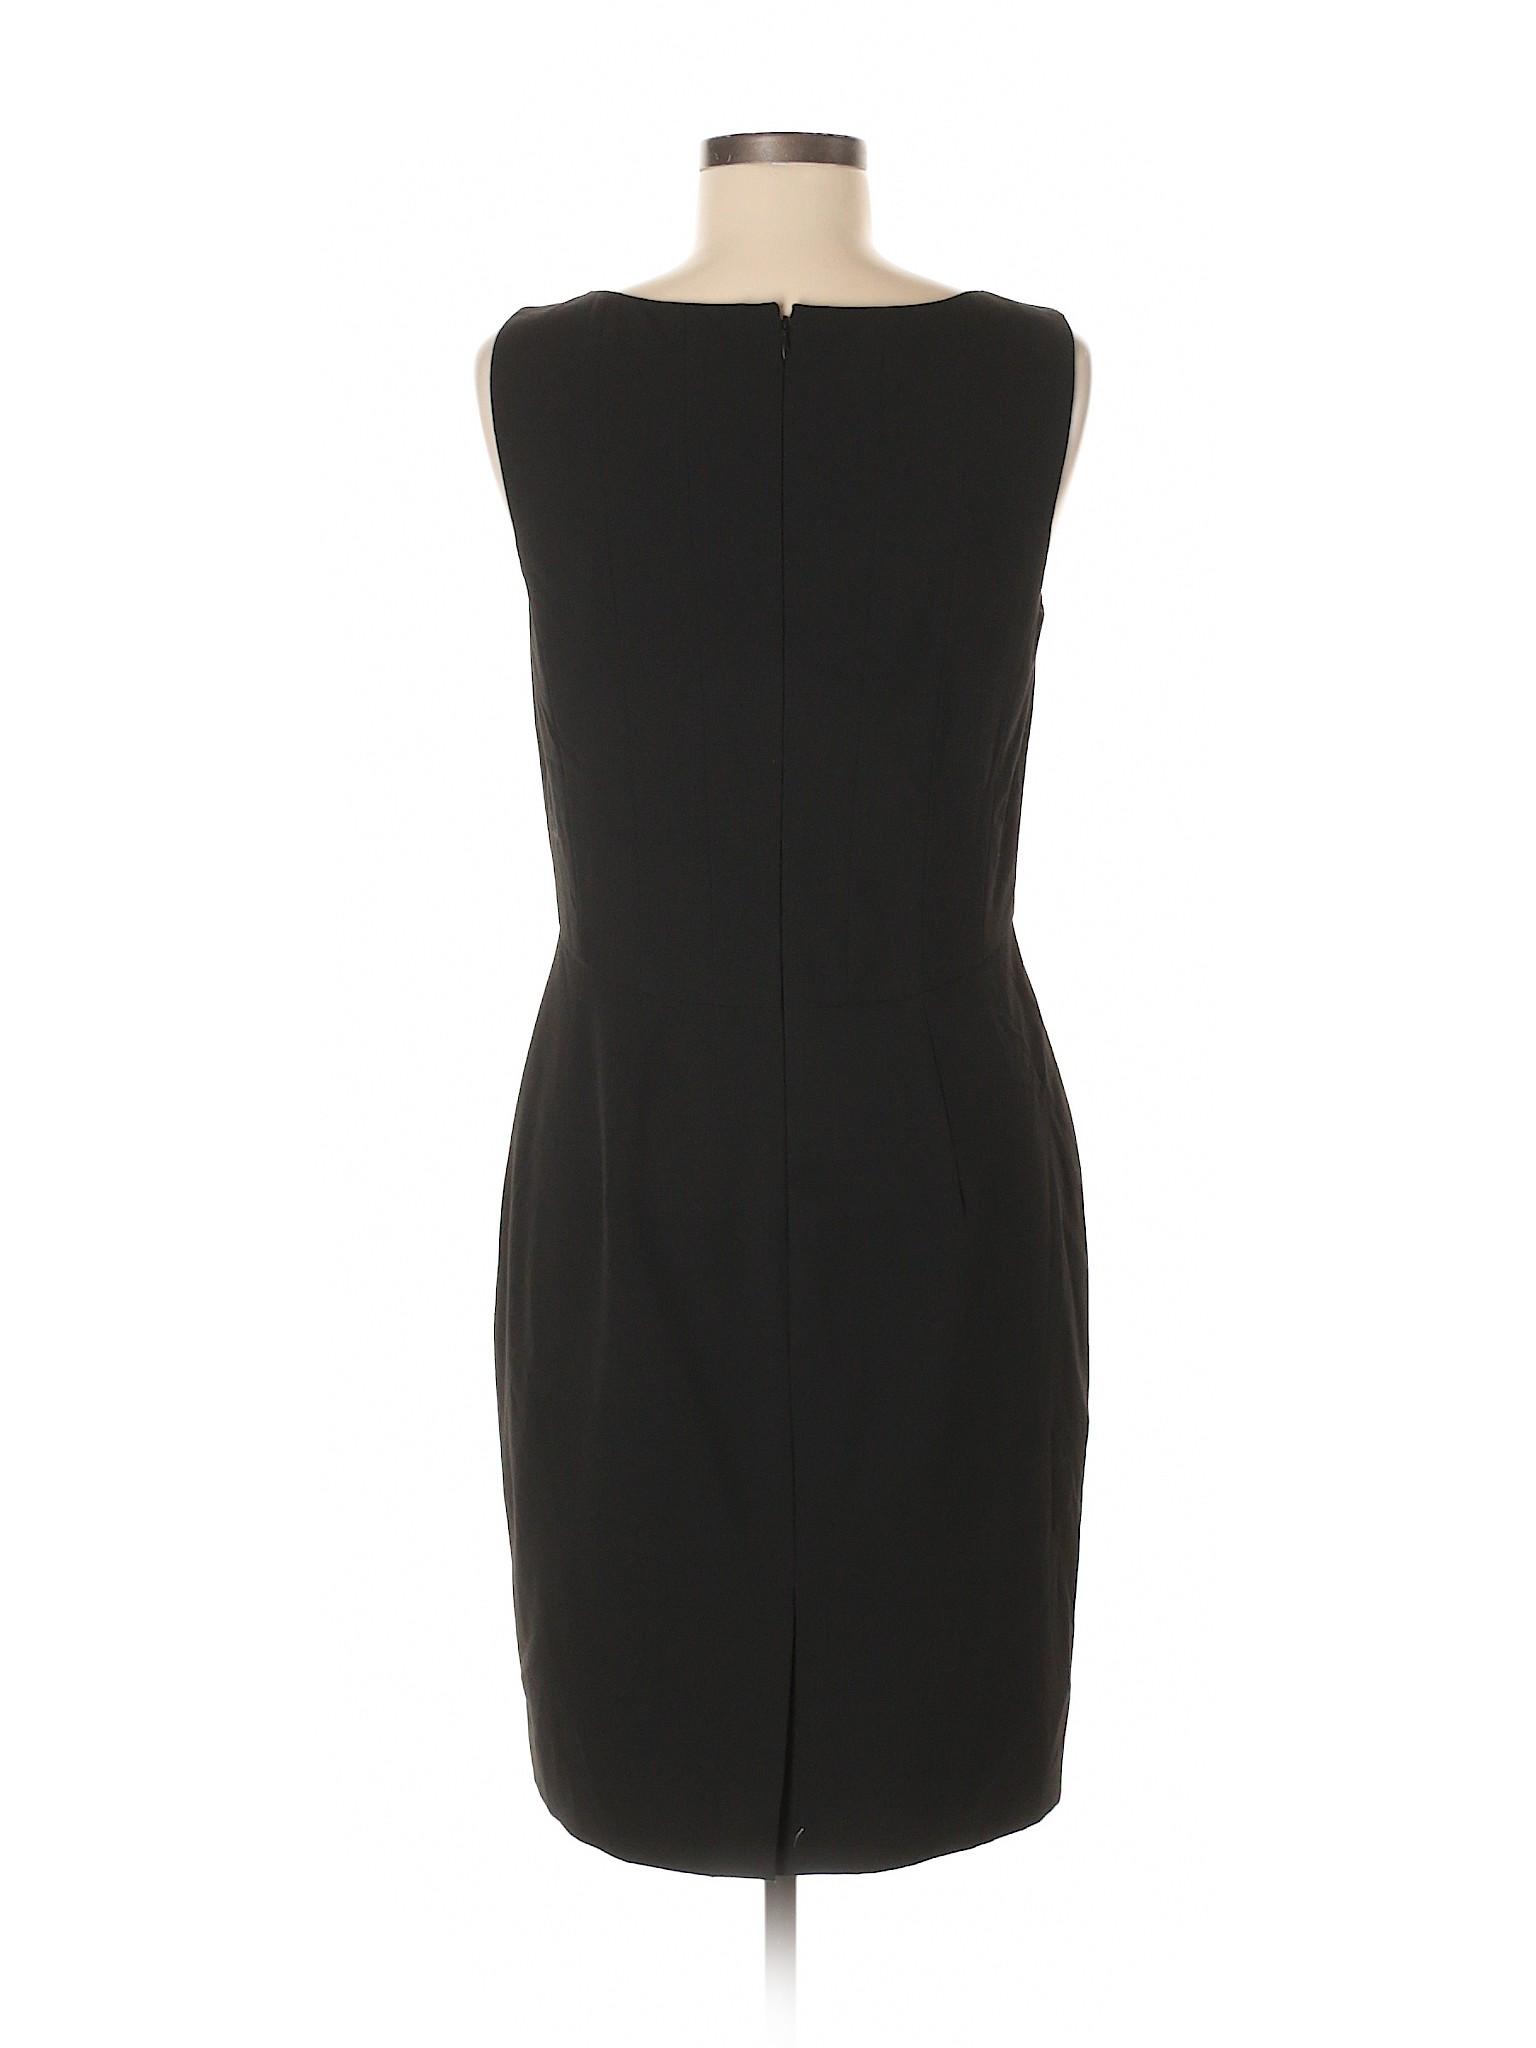 Casual winter Taylor Boutique Dress Ann Otqc7f